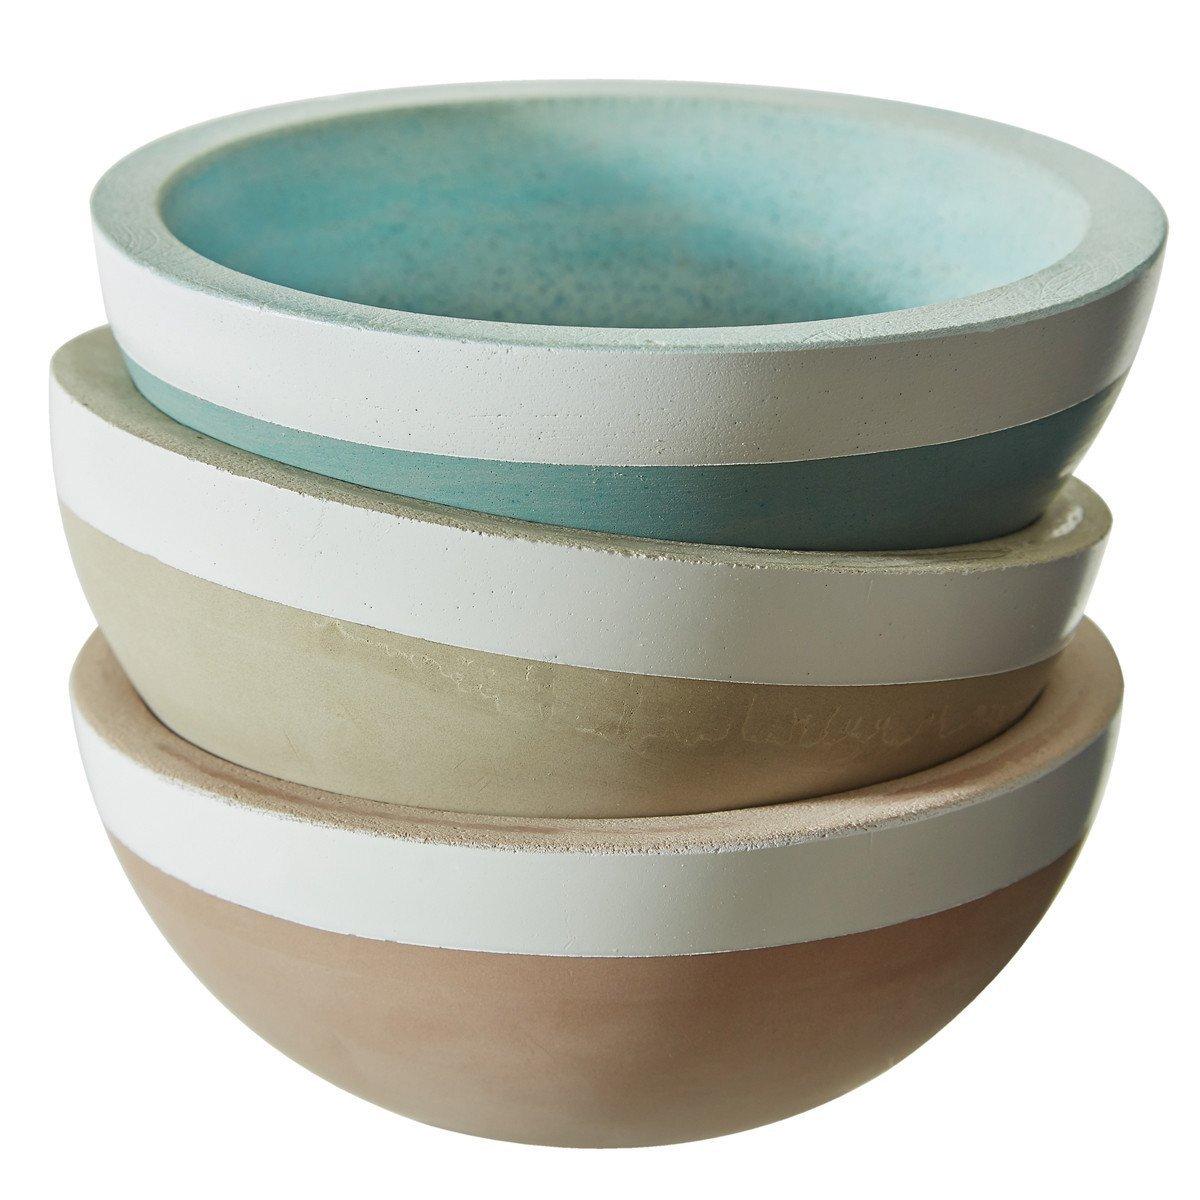 Bowls_White_Trio_1024x1024@2x